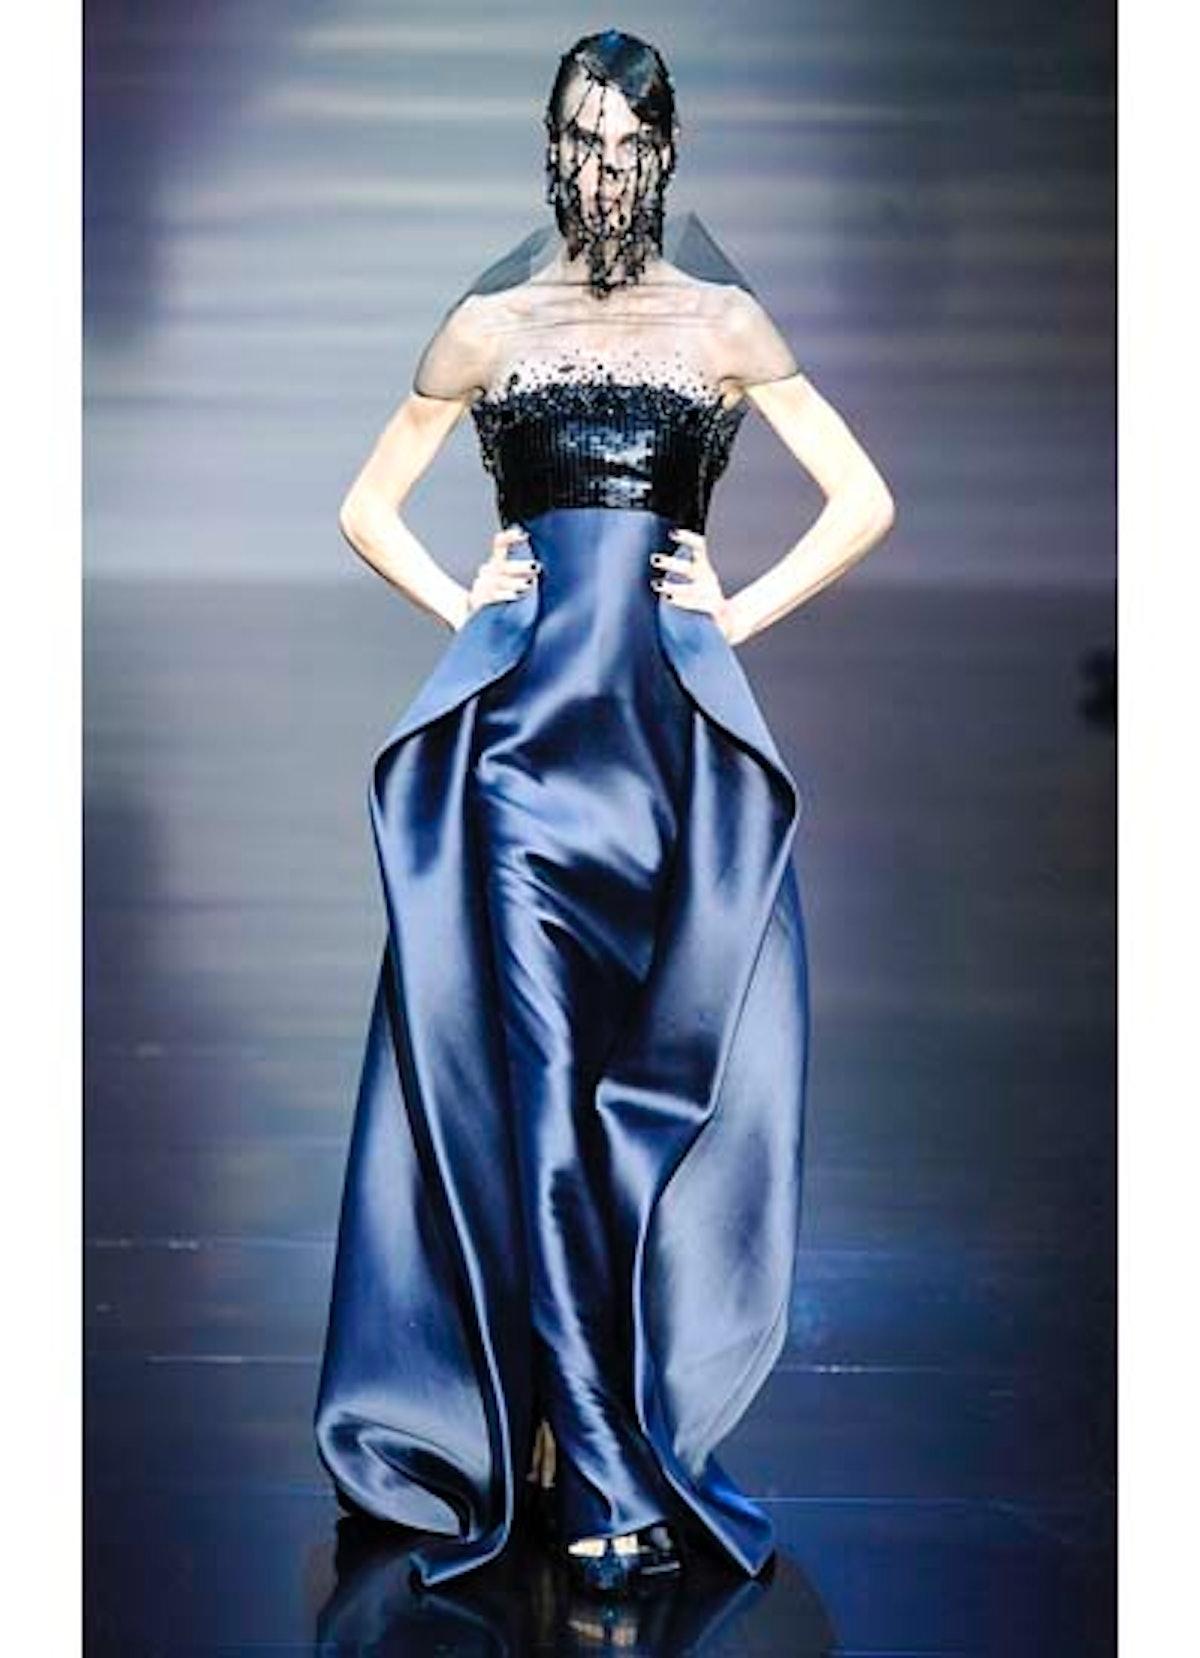 fass-giorgio-armani-couture-2012-runway-40-v.jpg